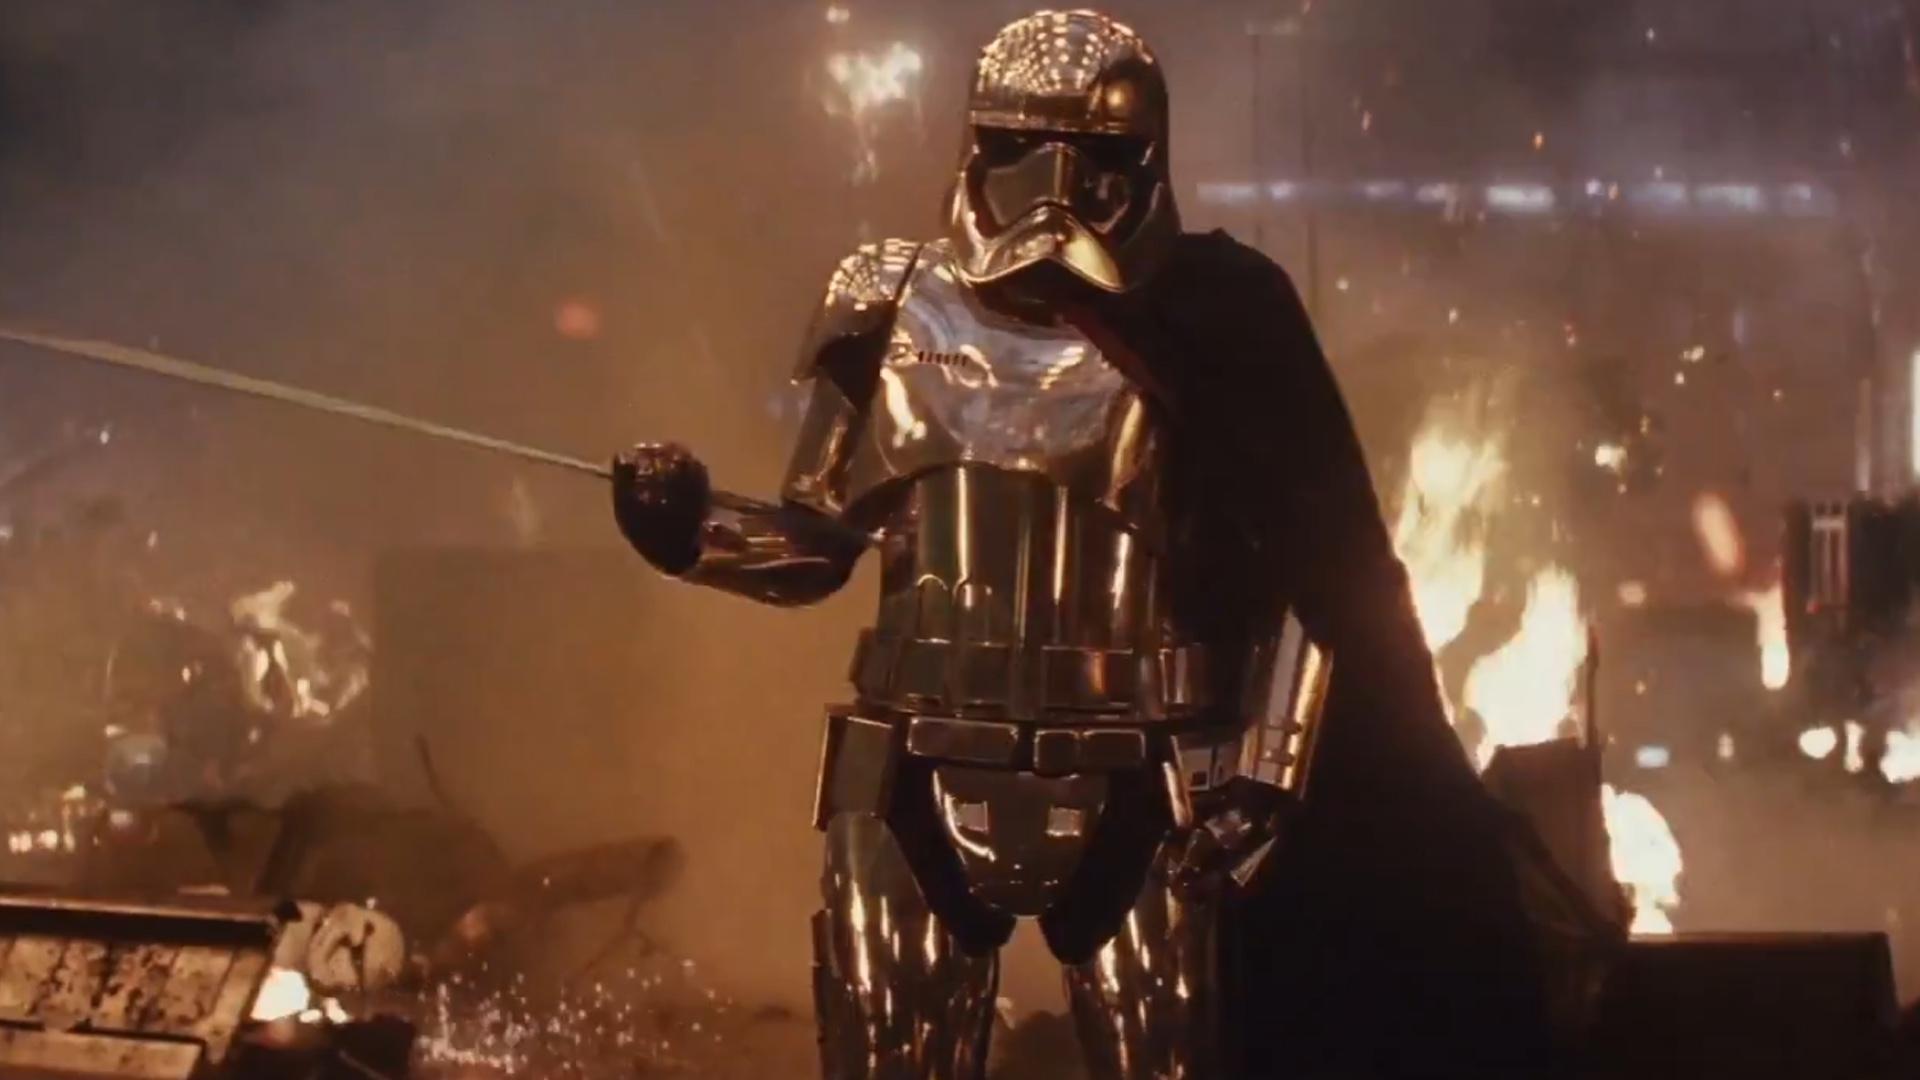 star-wars-the-last-jedi-confirmed-to-be-the-longest-star-wars-film-yet-social.jpg